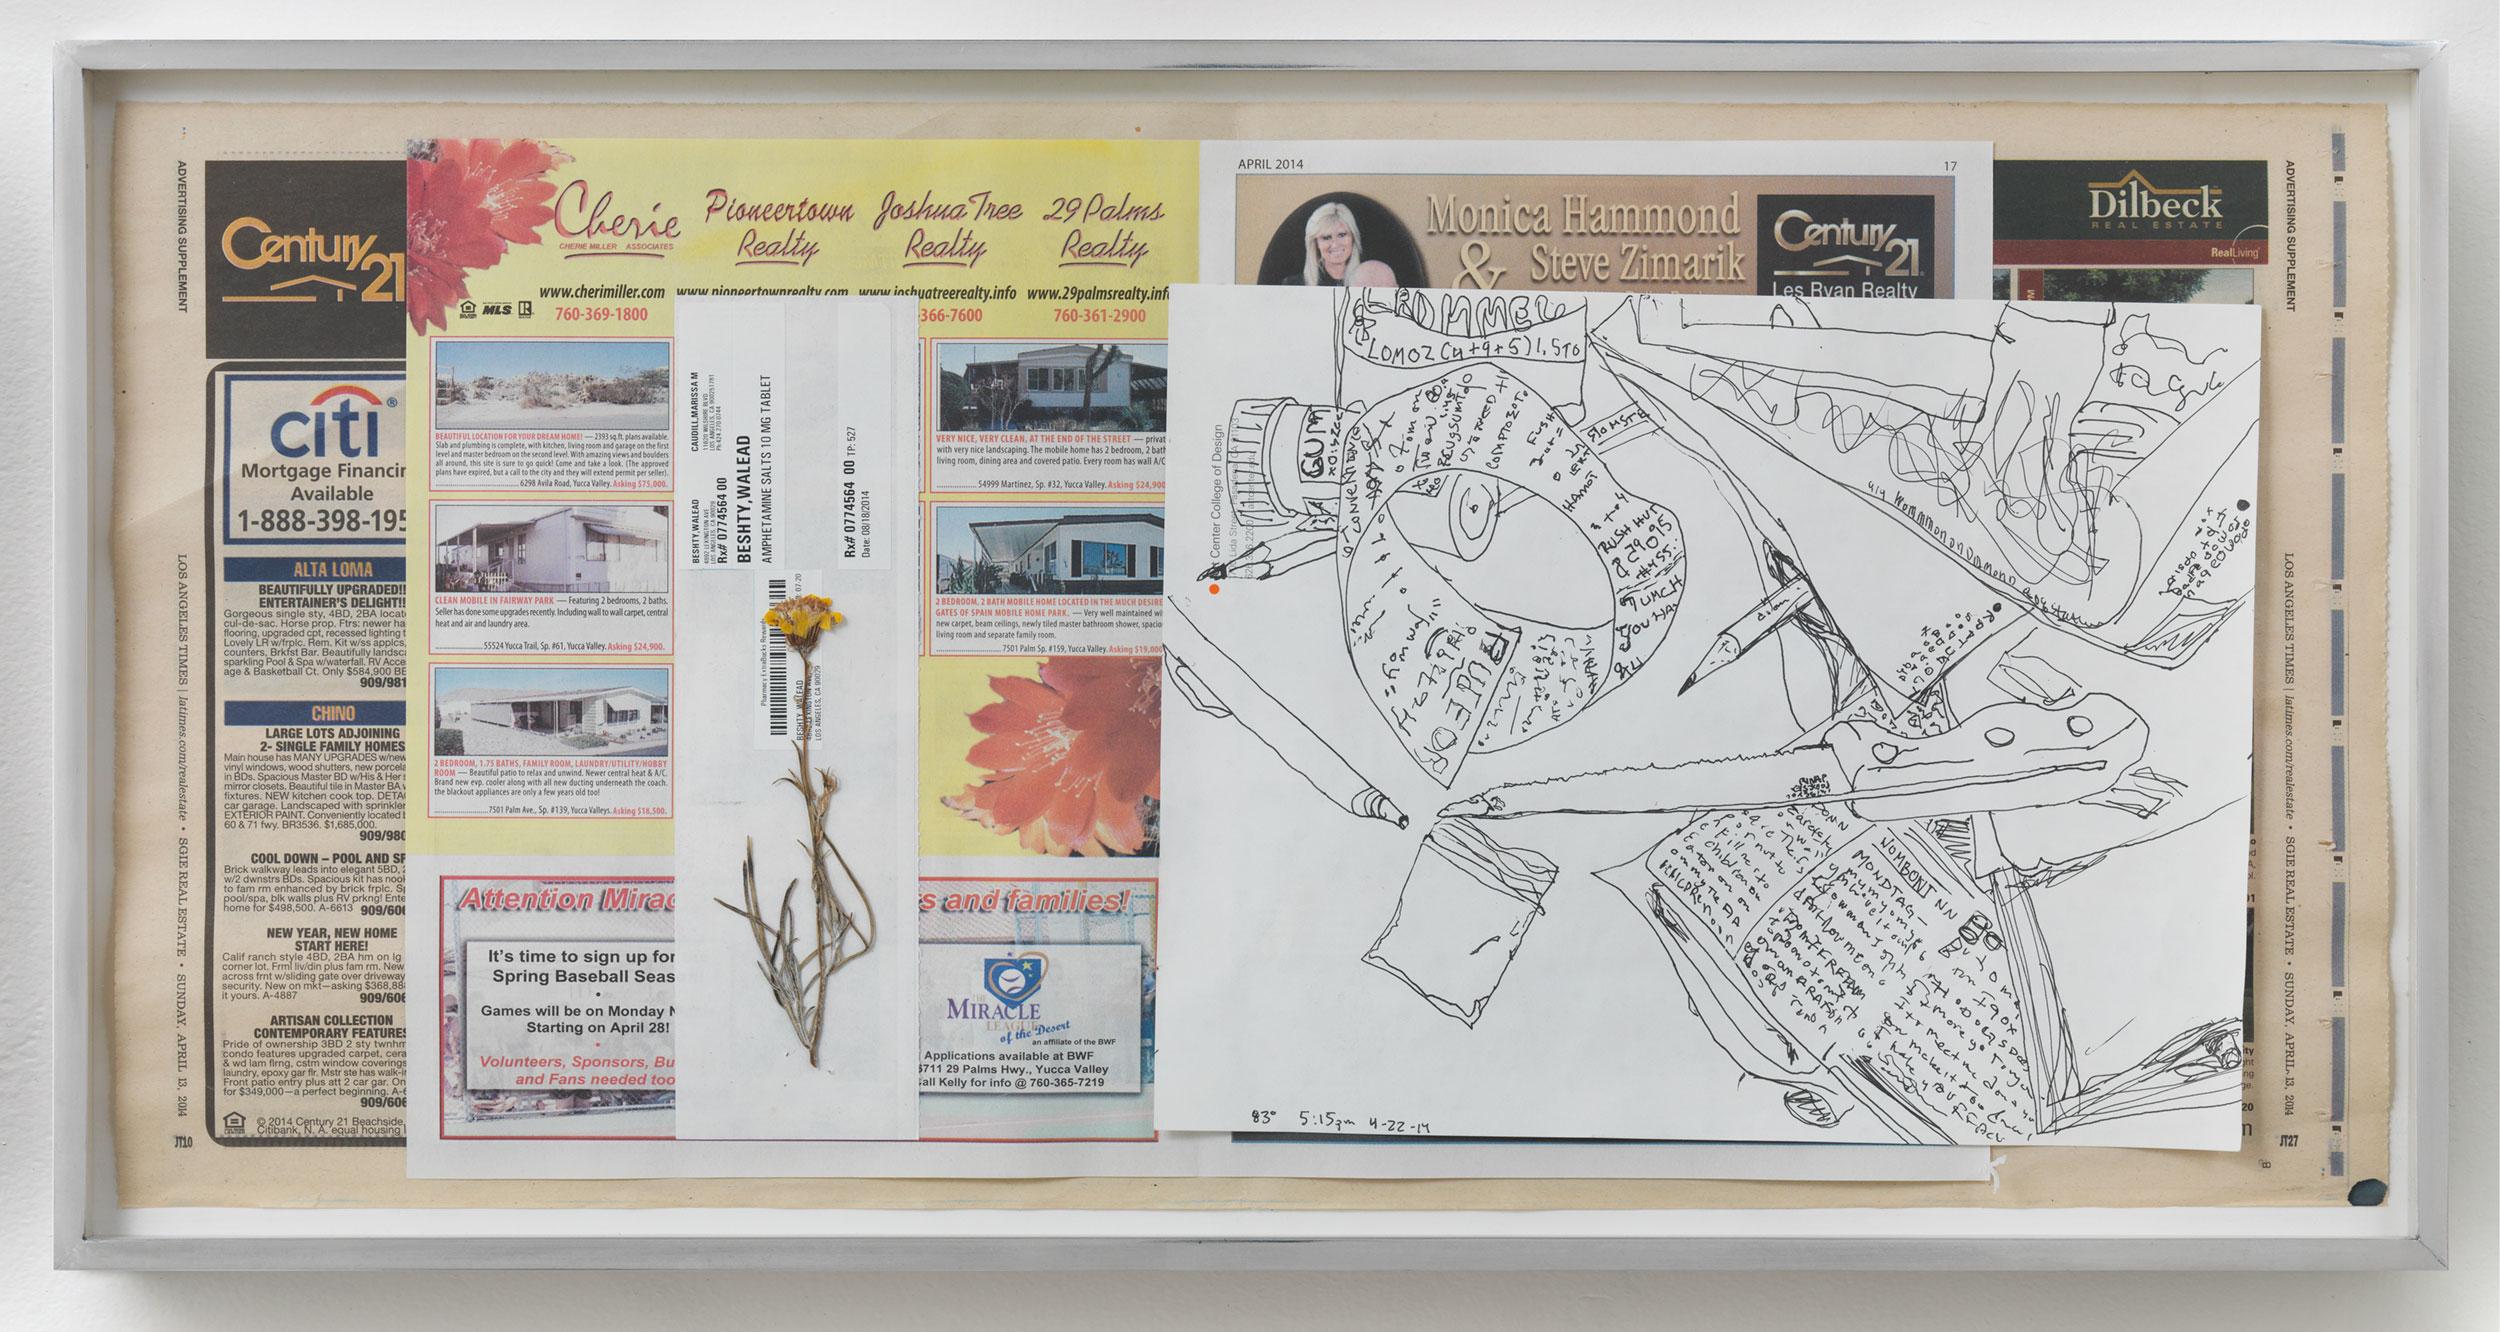 Corn Hustlers Nabbed; Ad Agency Blues: Pay Play in binge lawsuit, 86º, 2:45pm, 22-4-14   2014  Ink on paper, envelope, dried flower, newspaper  12 x 22 inches   Drawings, 2014–    Gastarbeiten, 2014